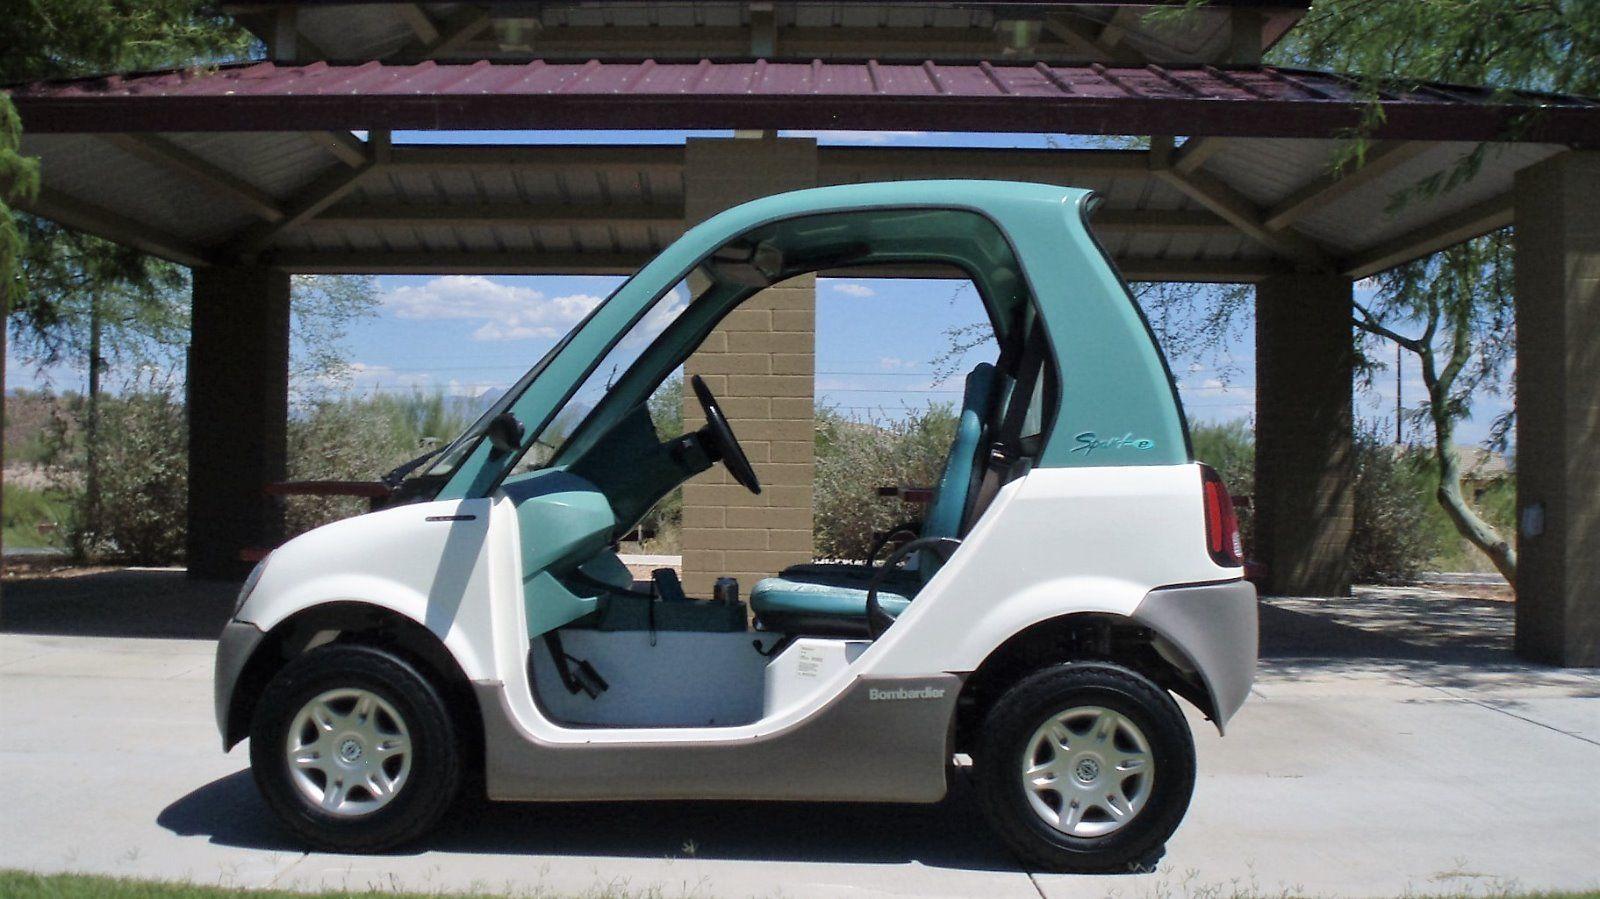 Bombardier NEV Golf Cart | Golf carts for sale | Pinterest | Golf ...